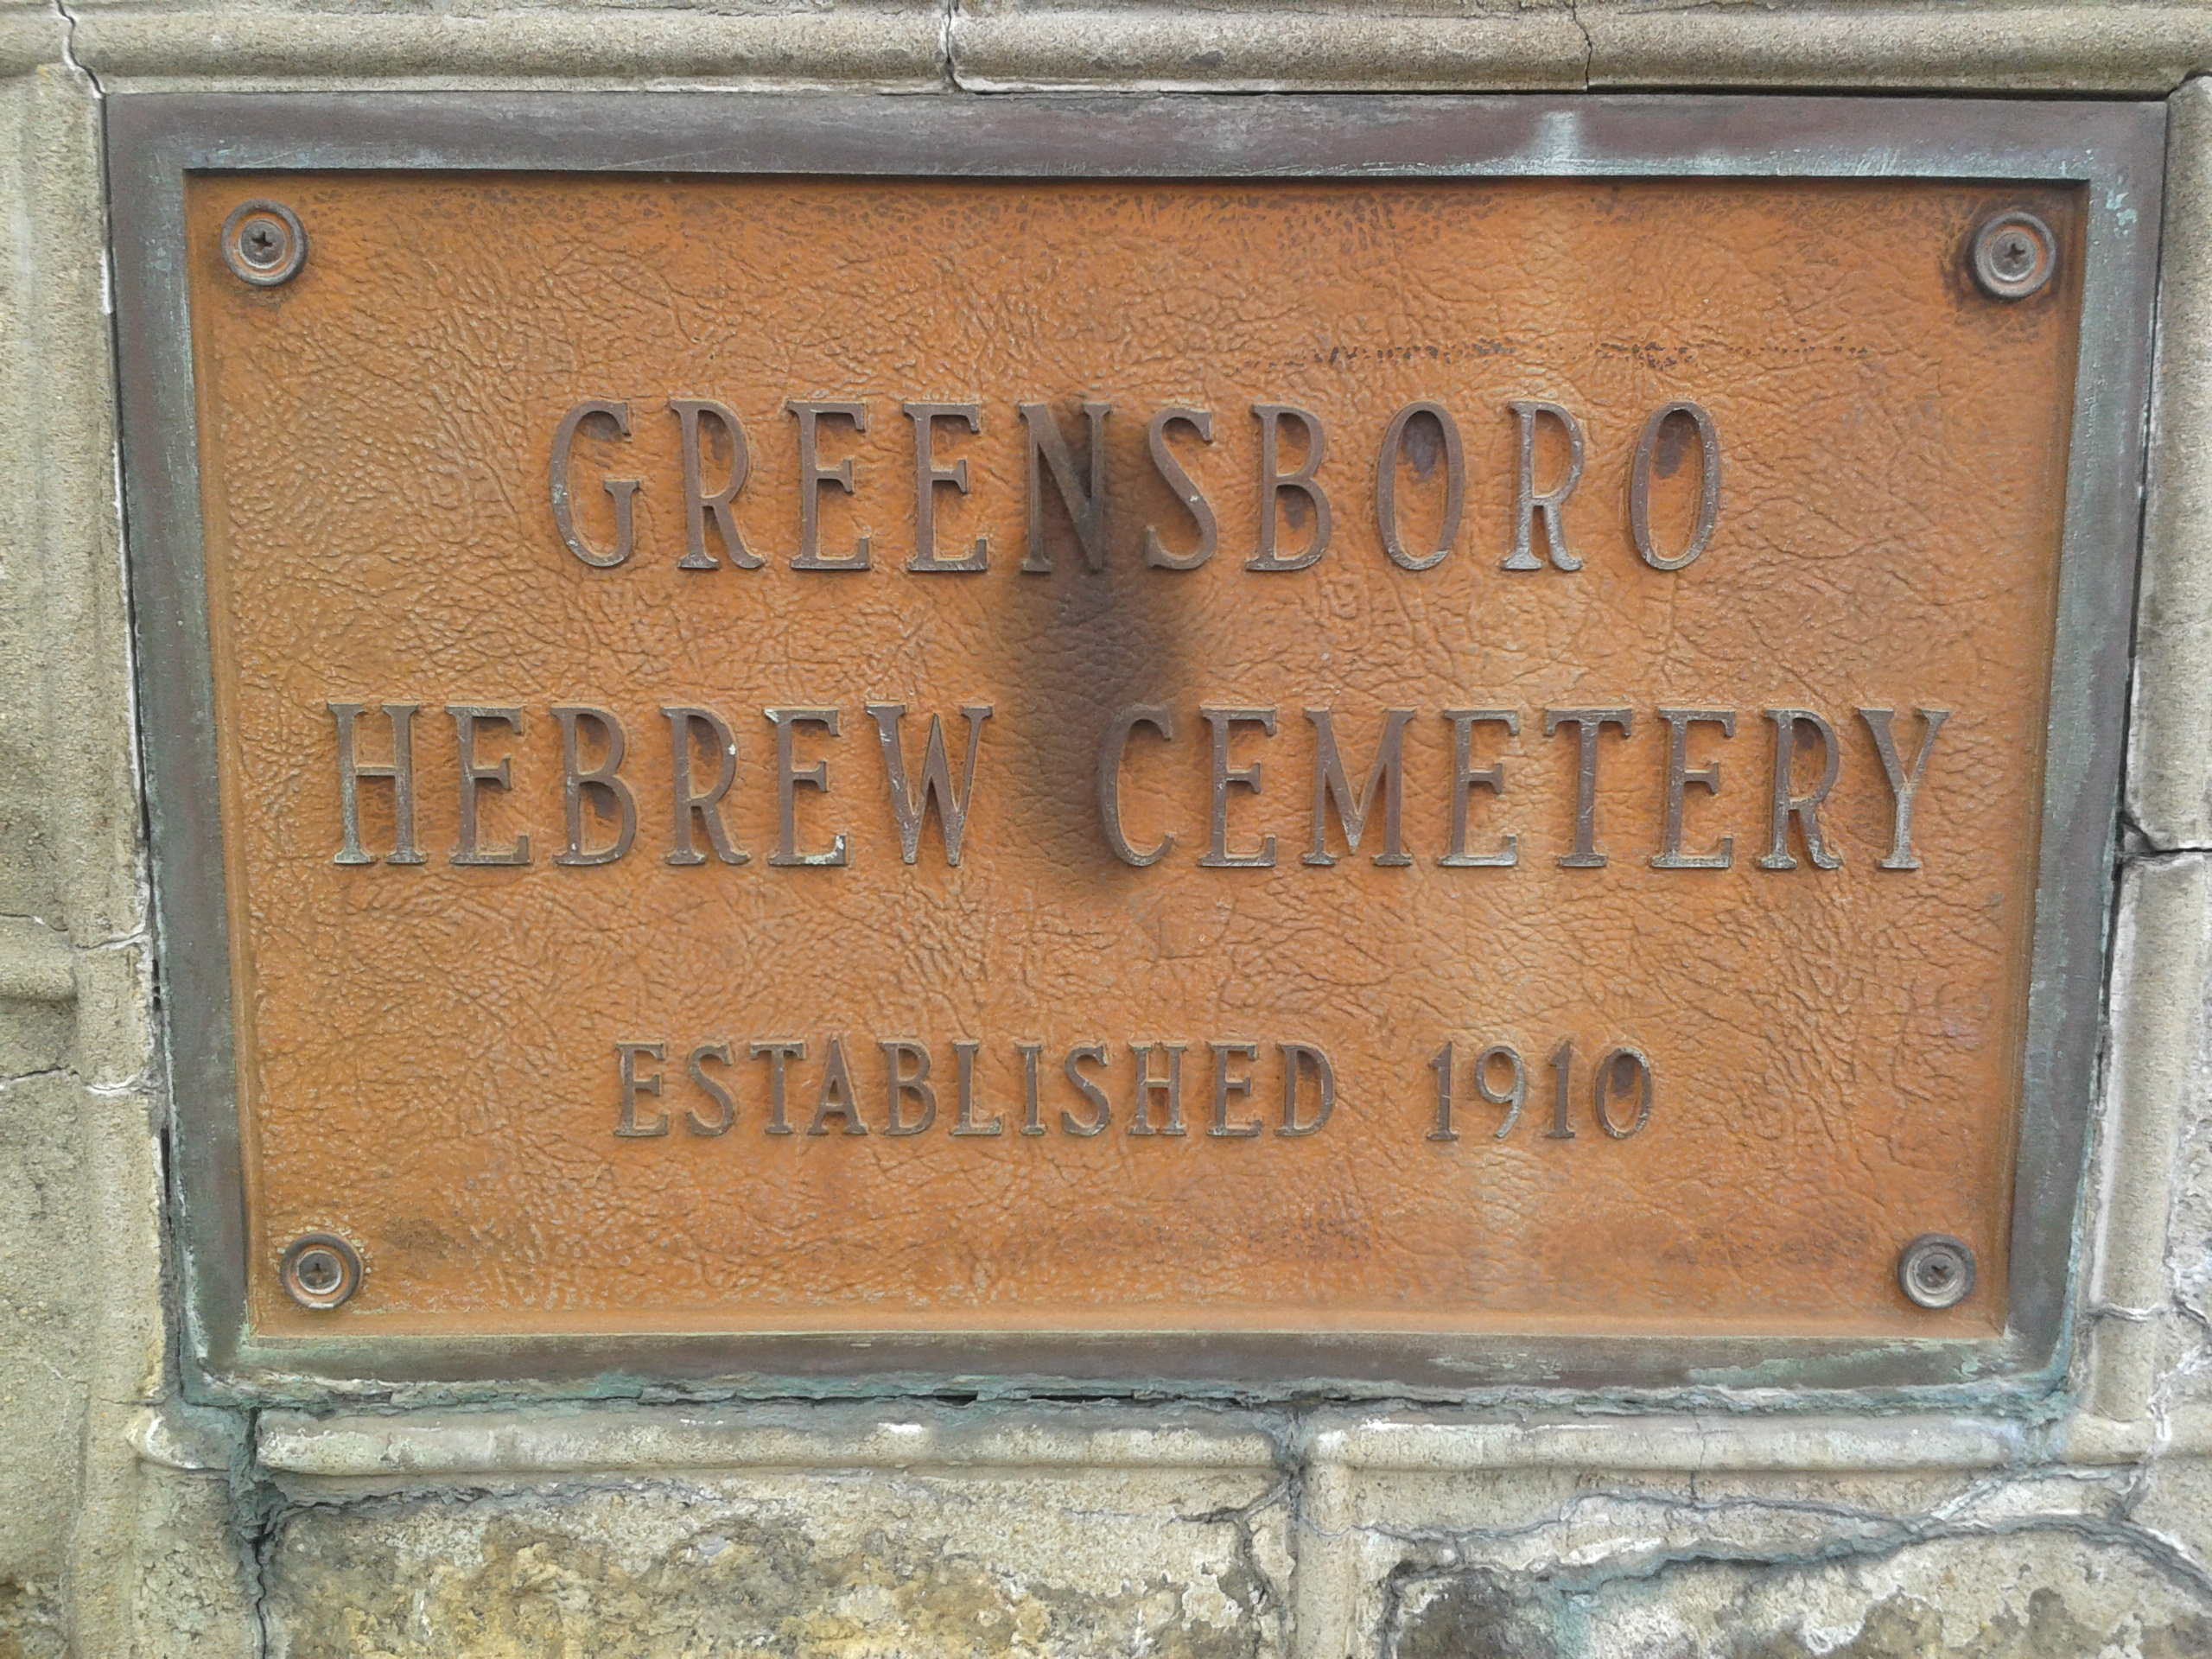 Greensboro Hebrew Cemetery